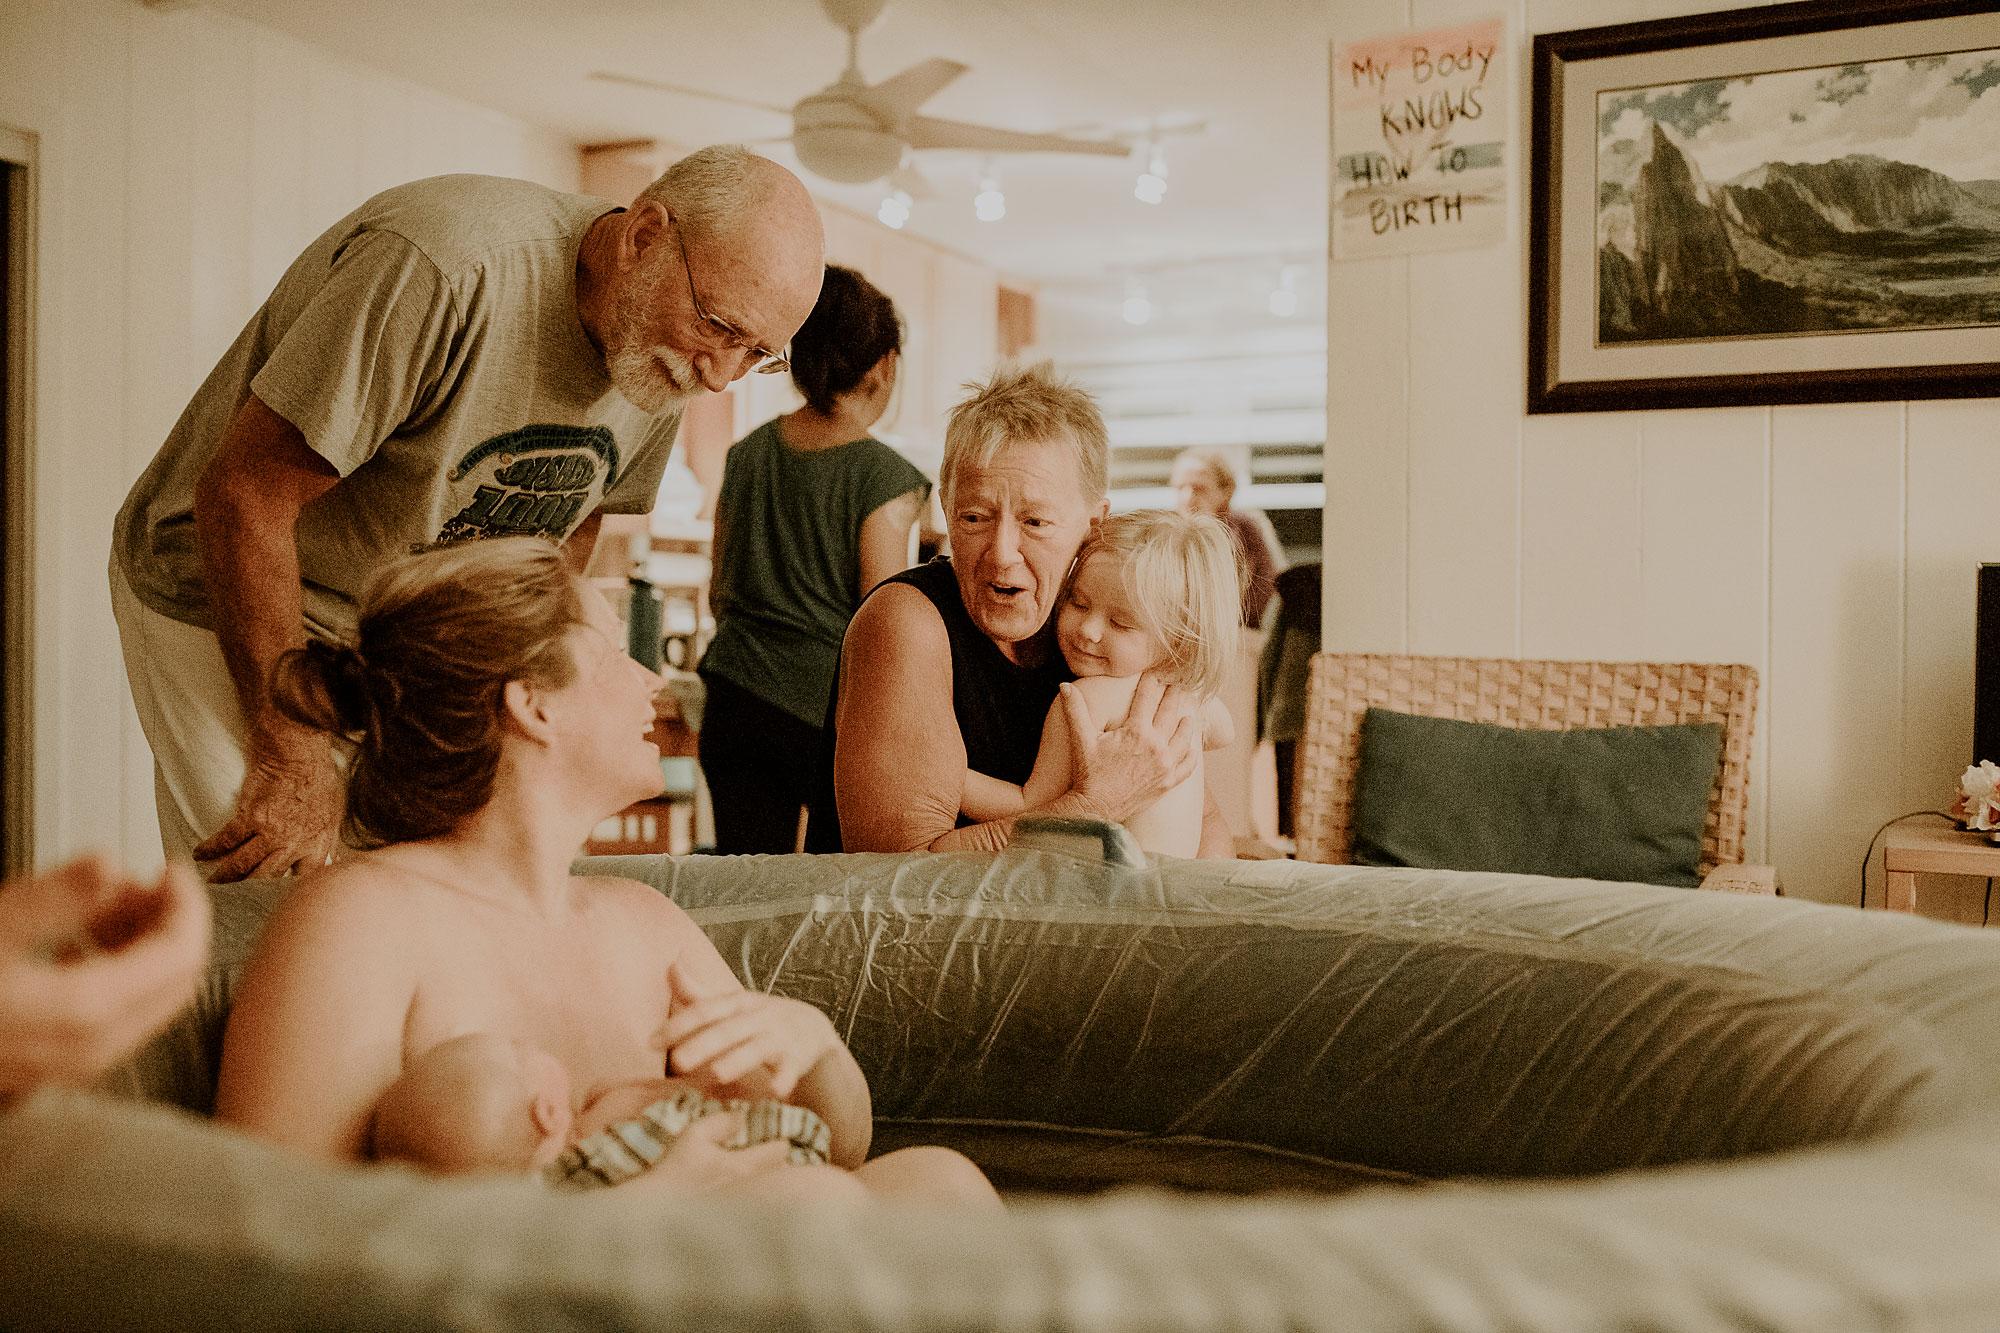 Oahu-Home-Birth-Photographer-21.jpg